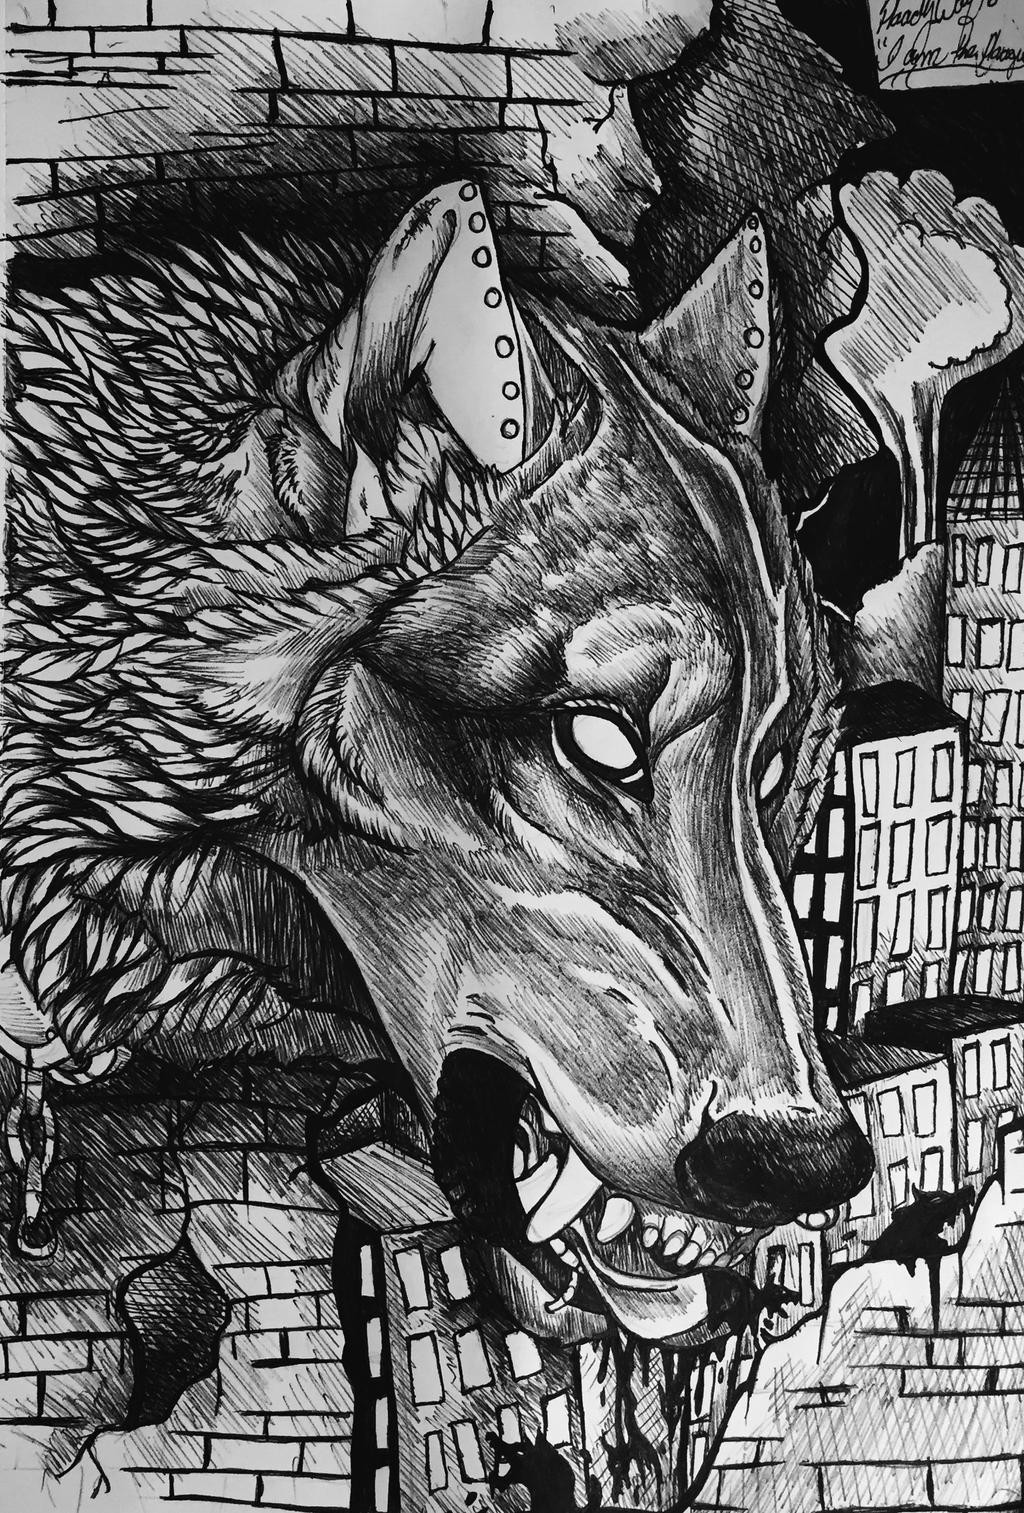 I am the plague by pladywolf82